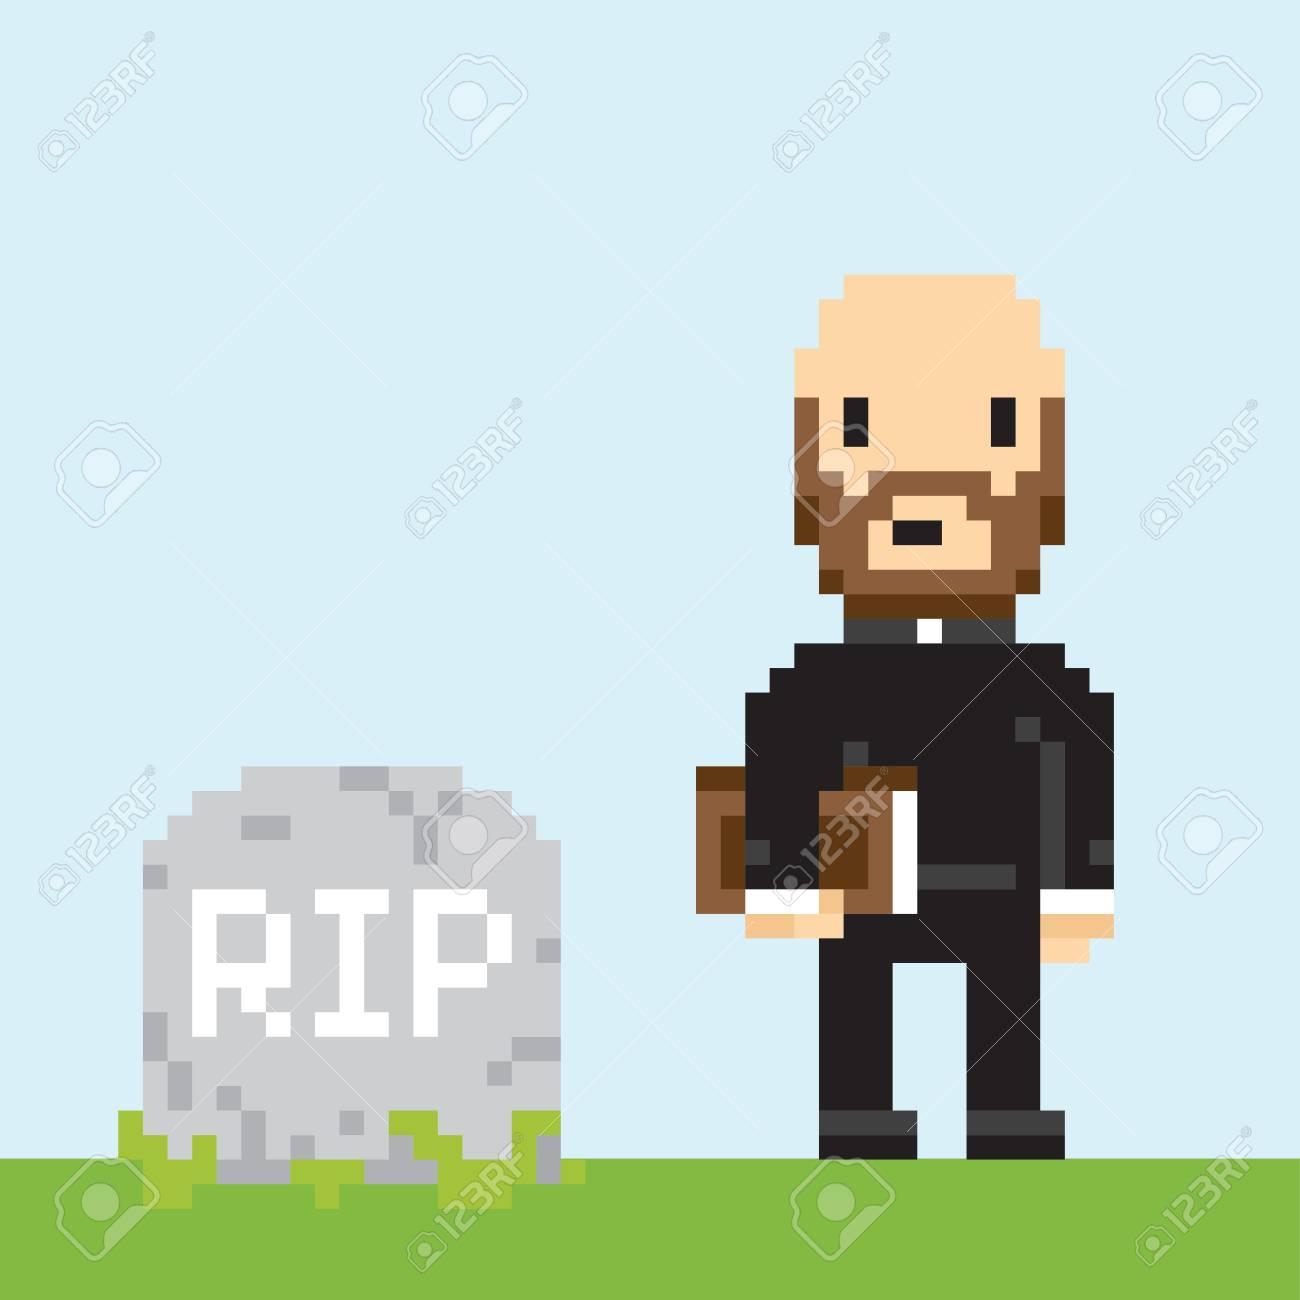 Pixel Art Art Art Nouveau En Una Ilustración Vectorial Funeral